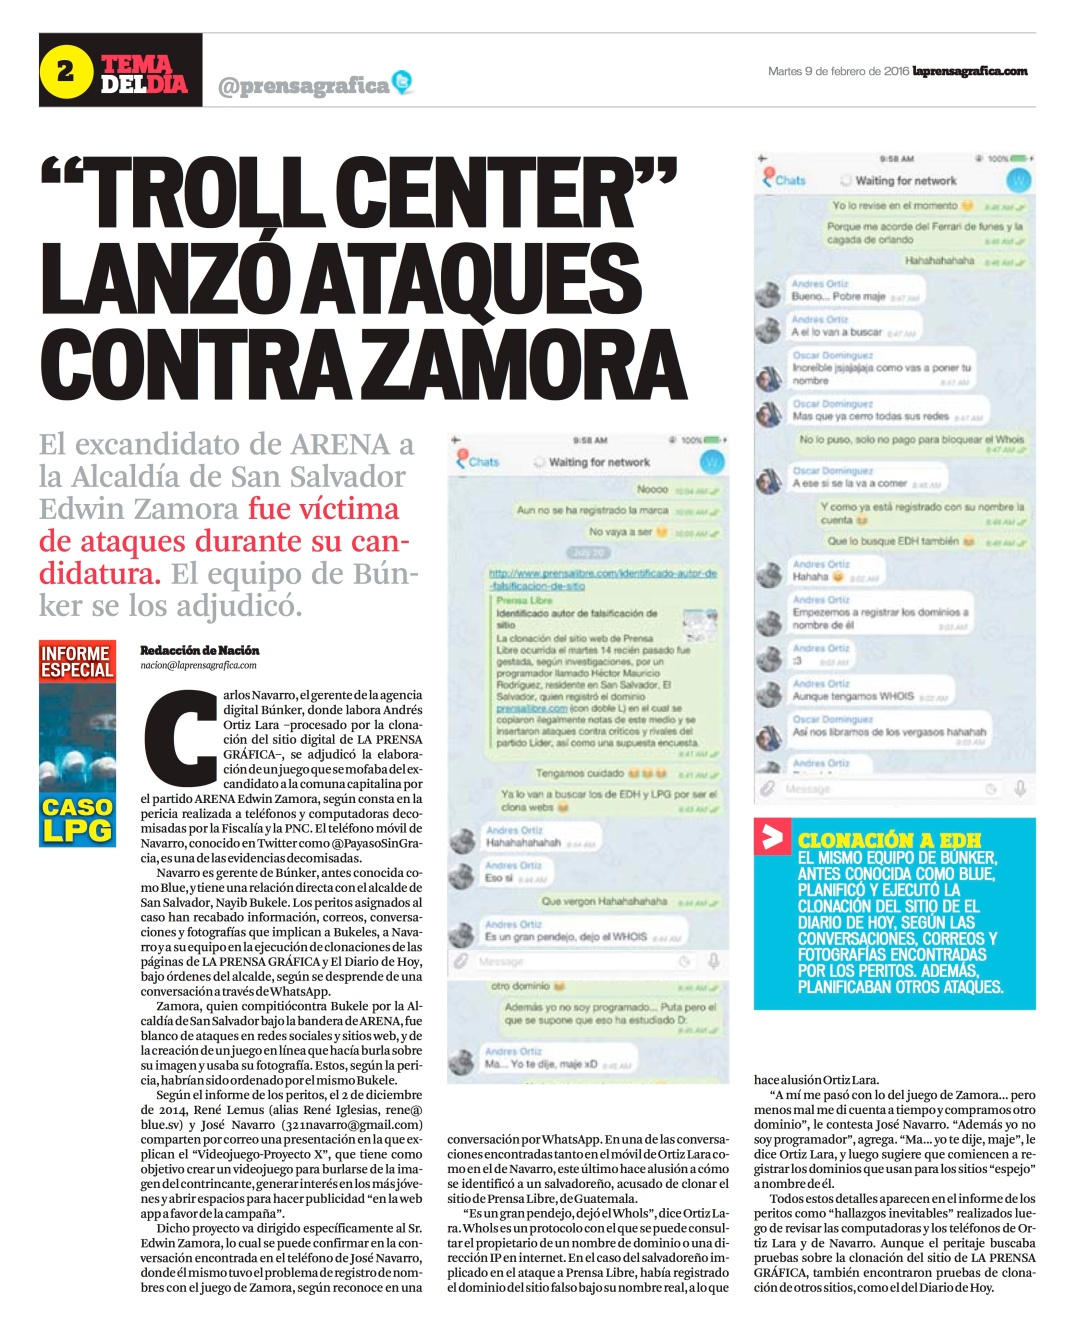 LPG20160209 - La Prensa Gráfica - PORTADA - pag 2